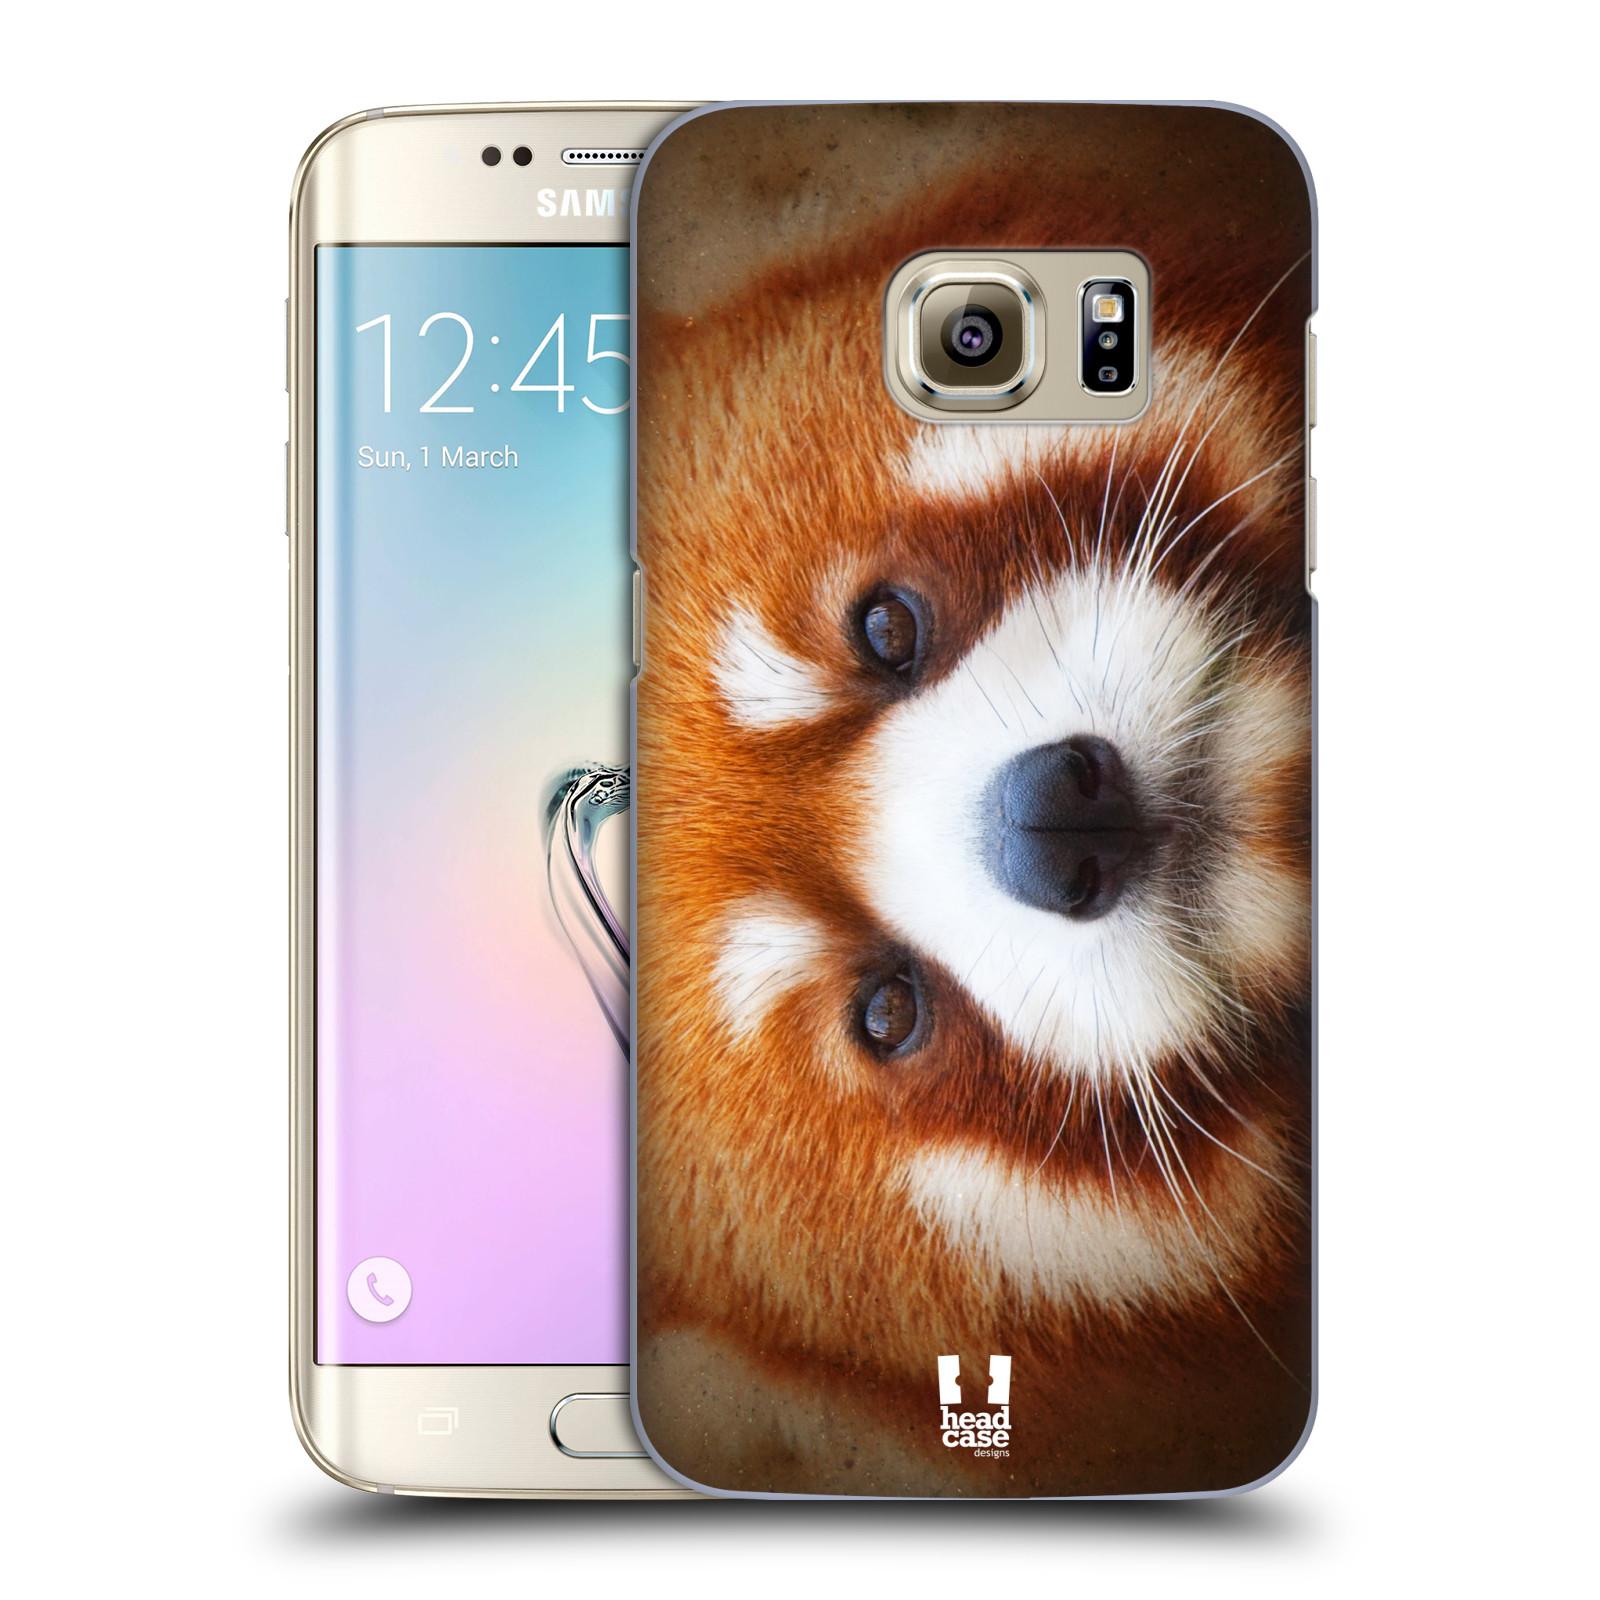 HEAD CASE plastový obal na mobil SAMSUNG GALAXY S7 EDGE vzor Zvířecí tváře 2 medvěd panda rudá